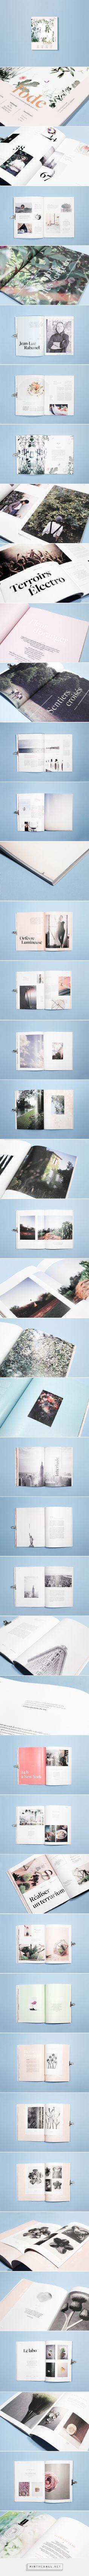 l'ode magazine - diptyque by Julie Ferrieux. Great editorial design!